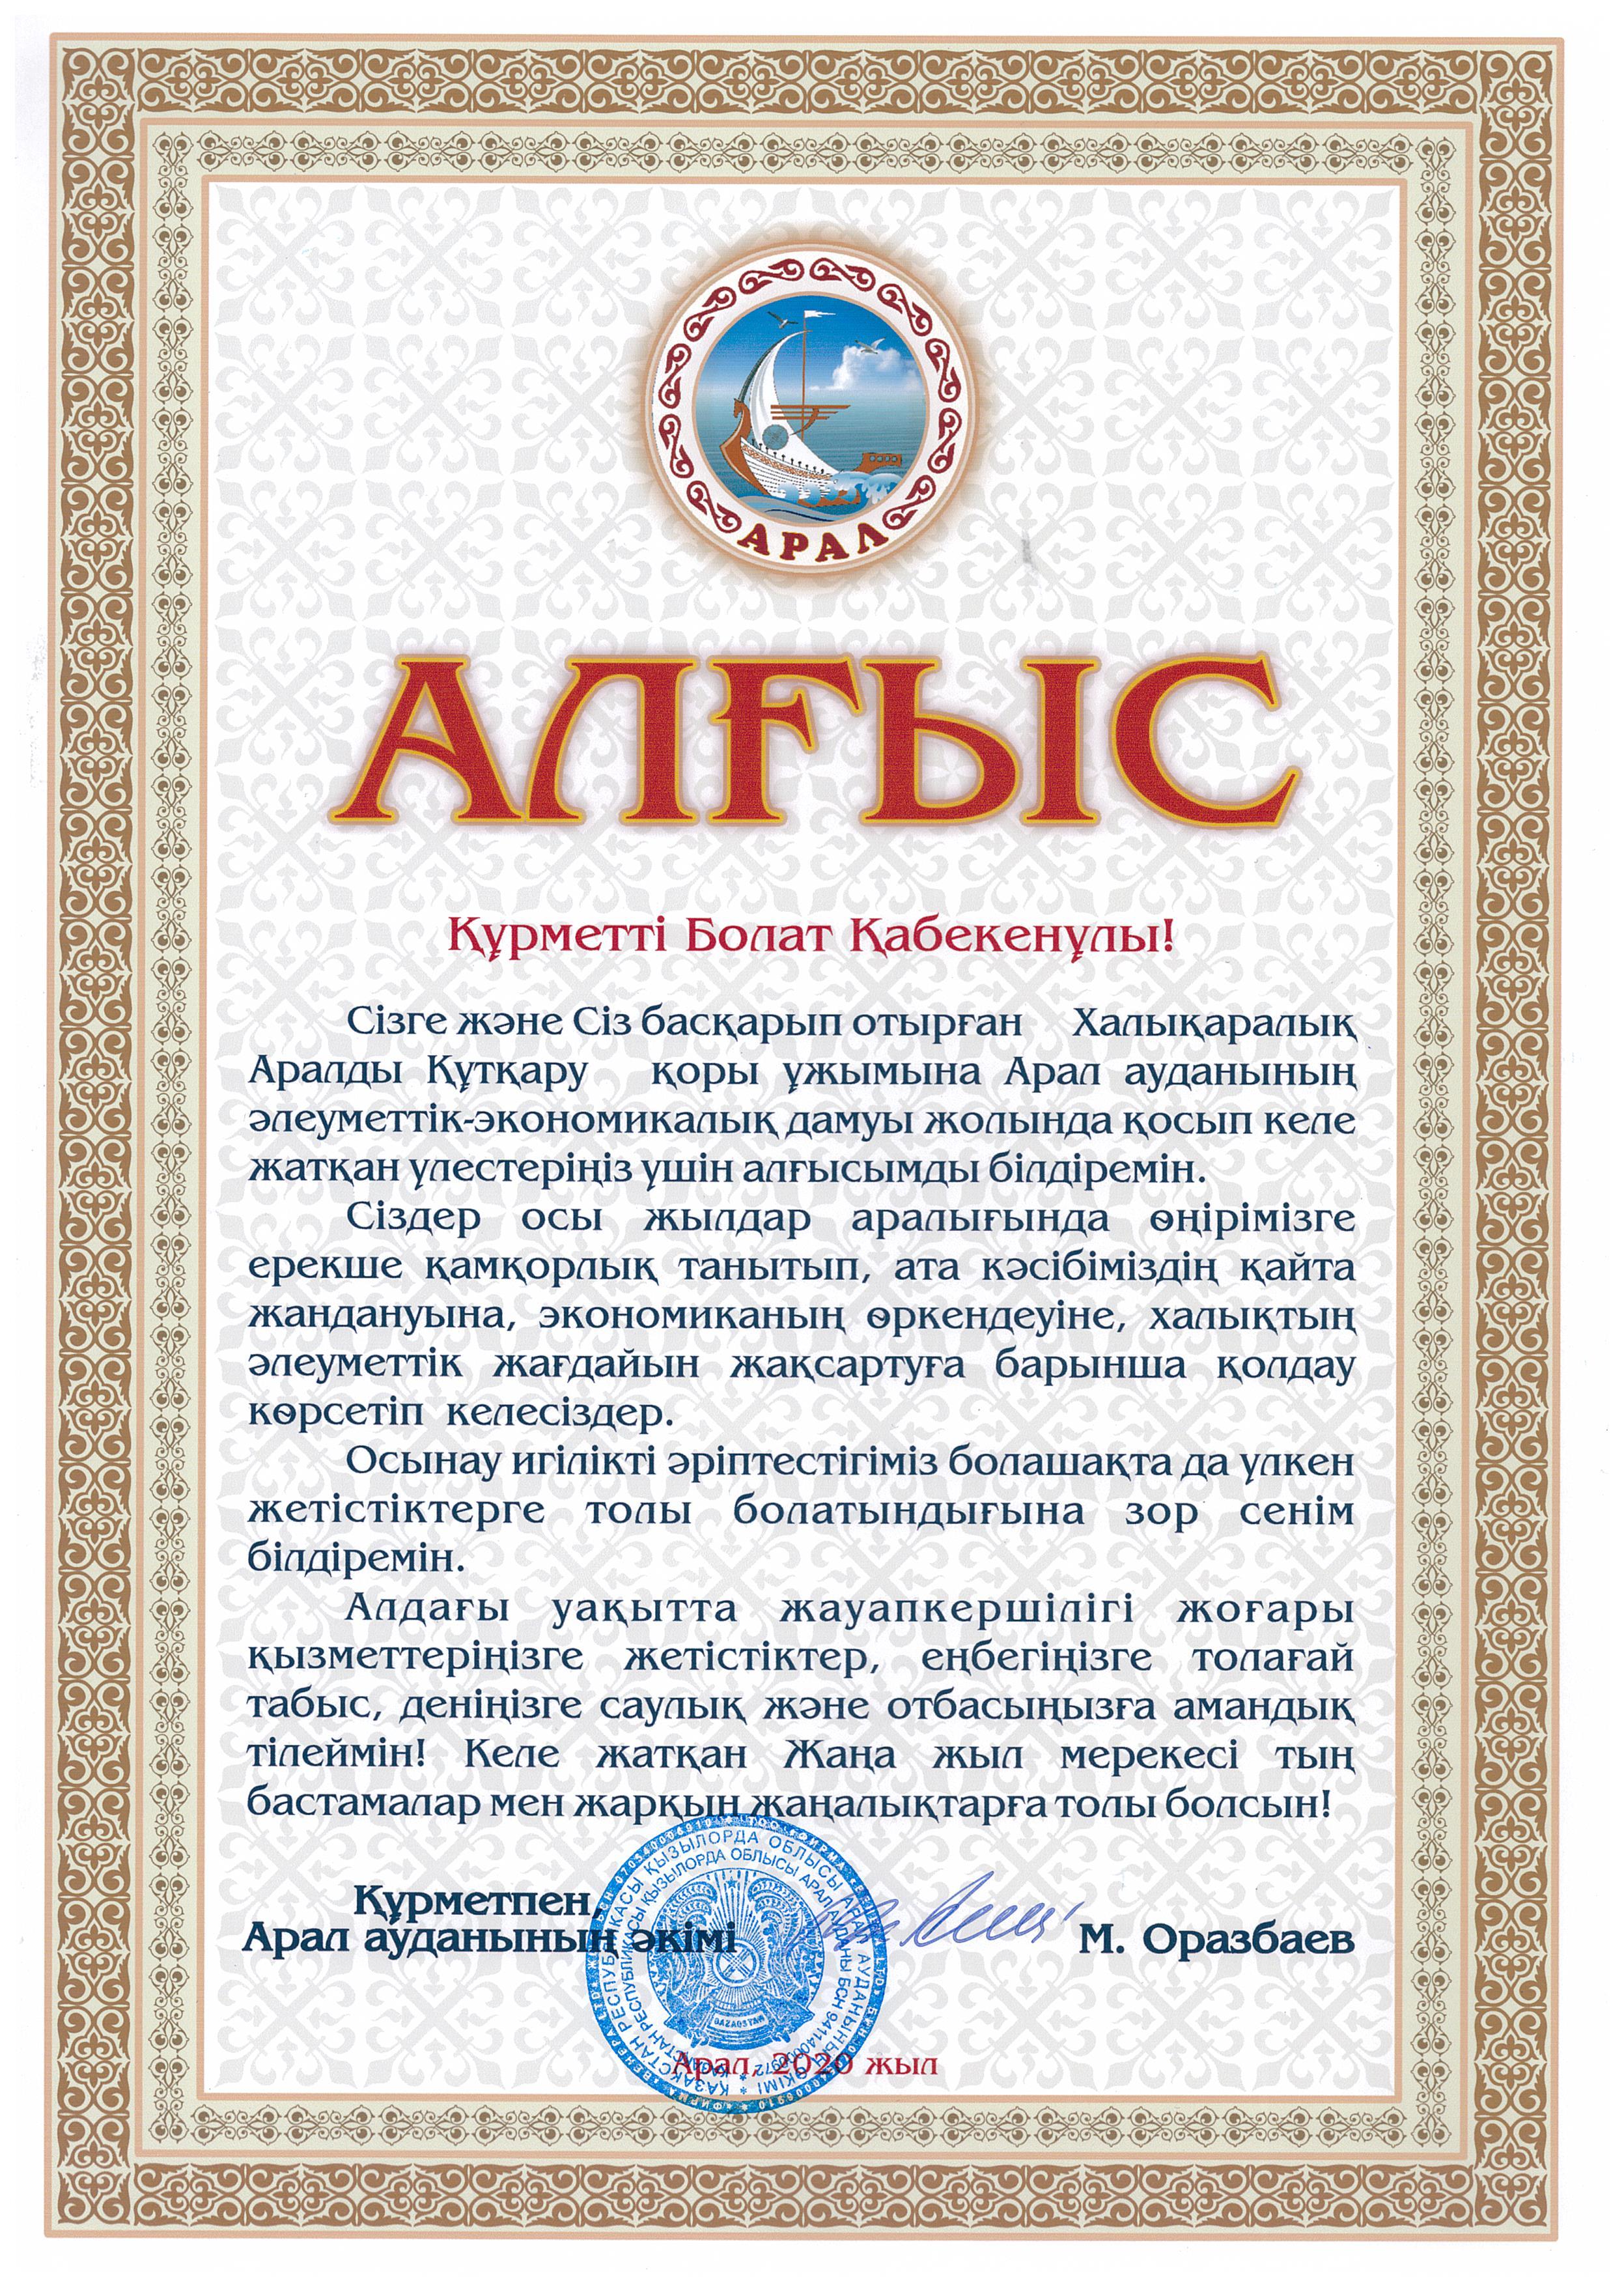 БП Аральский районный акимат каз 001